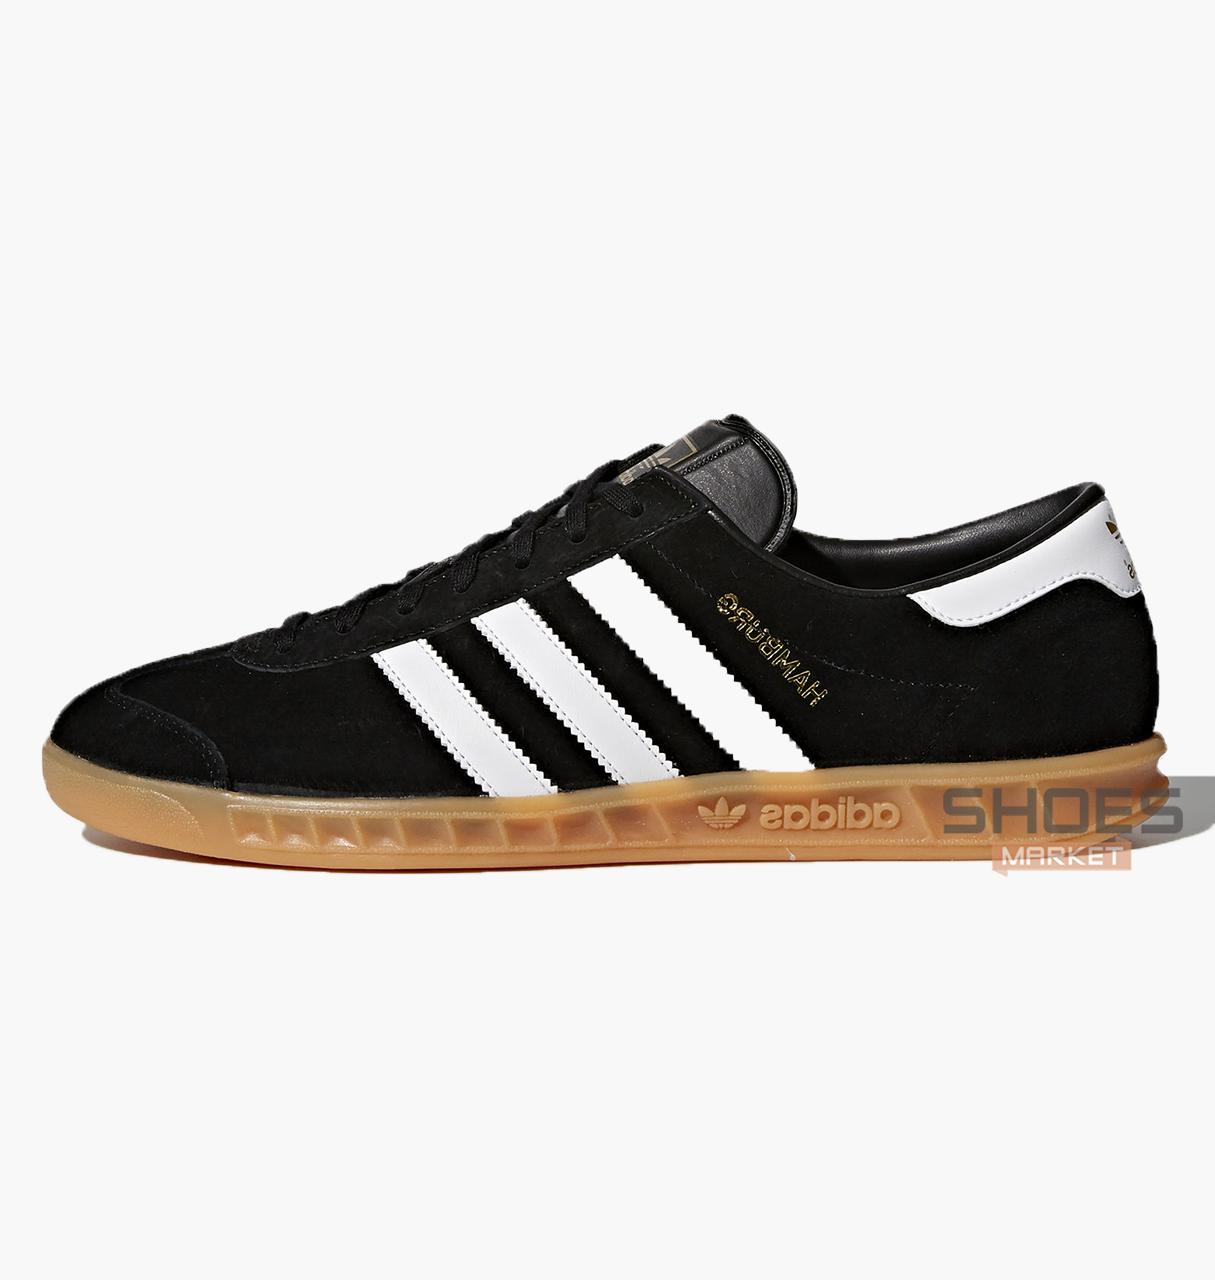 Мужские кроссовки  Adidas Hamburg Black S76696, оригинал